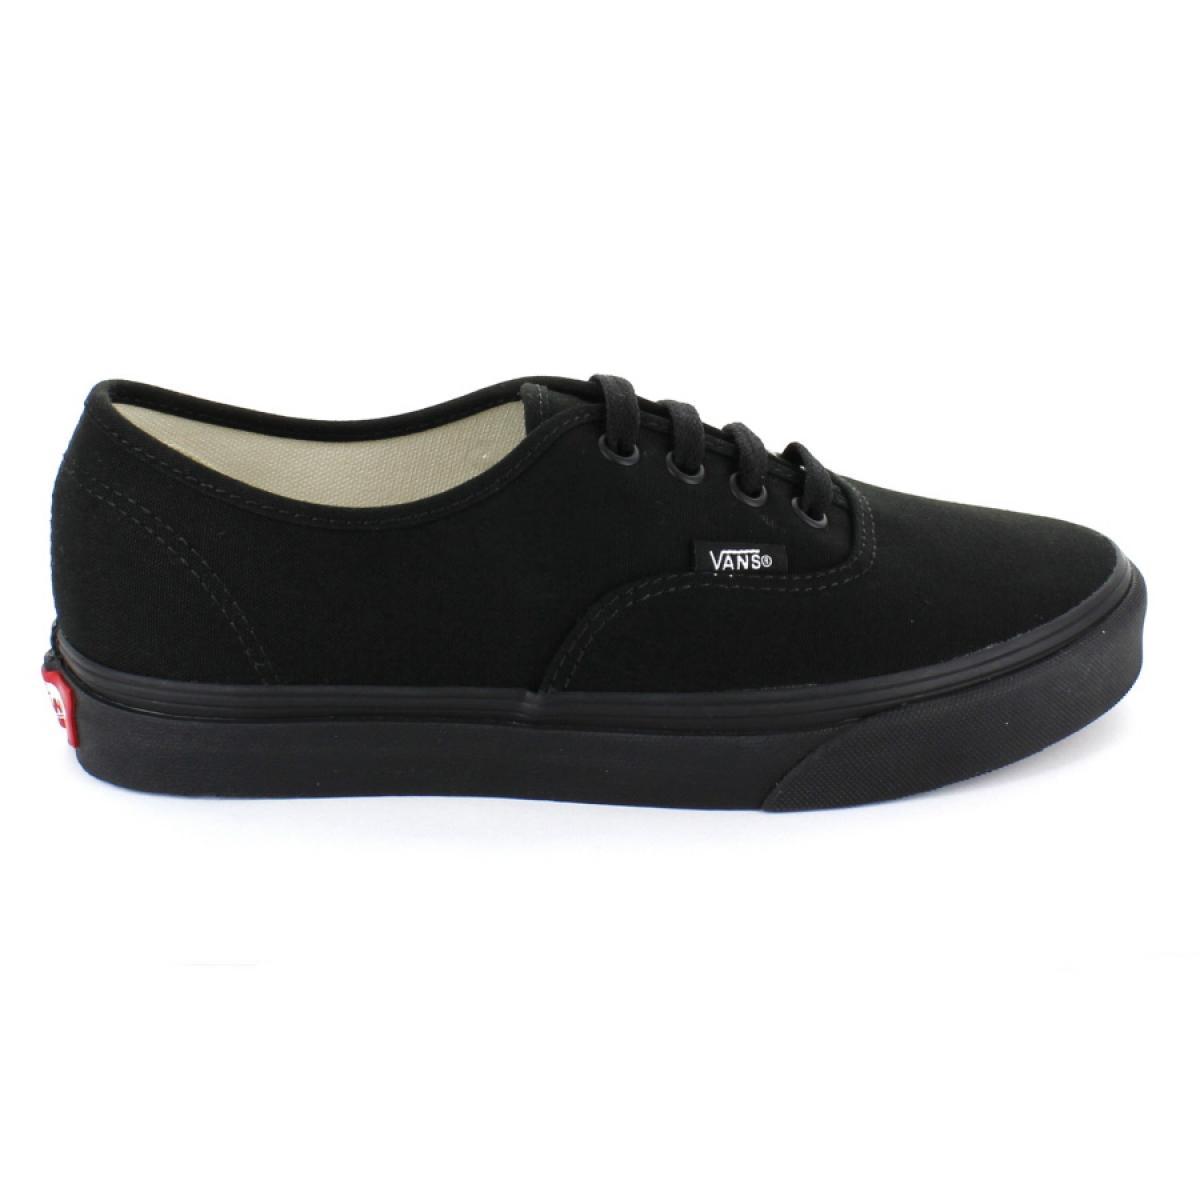 92badad6fd7a2 Tenis marca Vans modelo 0EE3BKA Color Negro   Negro